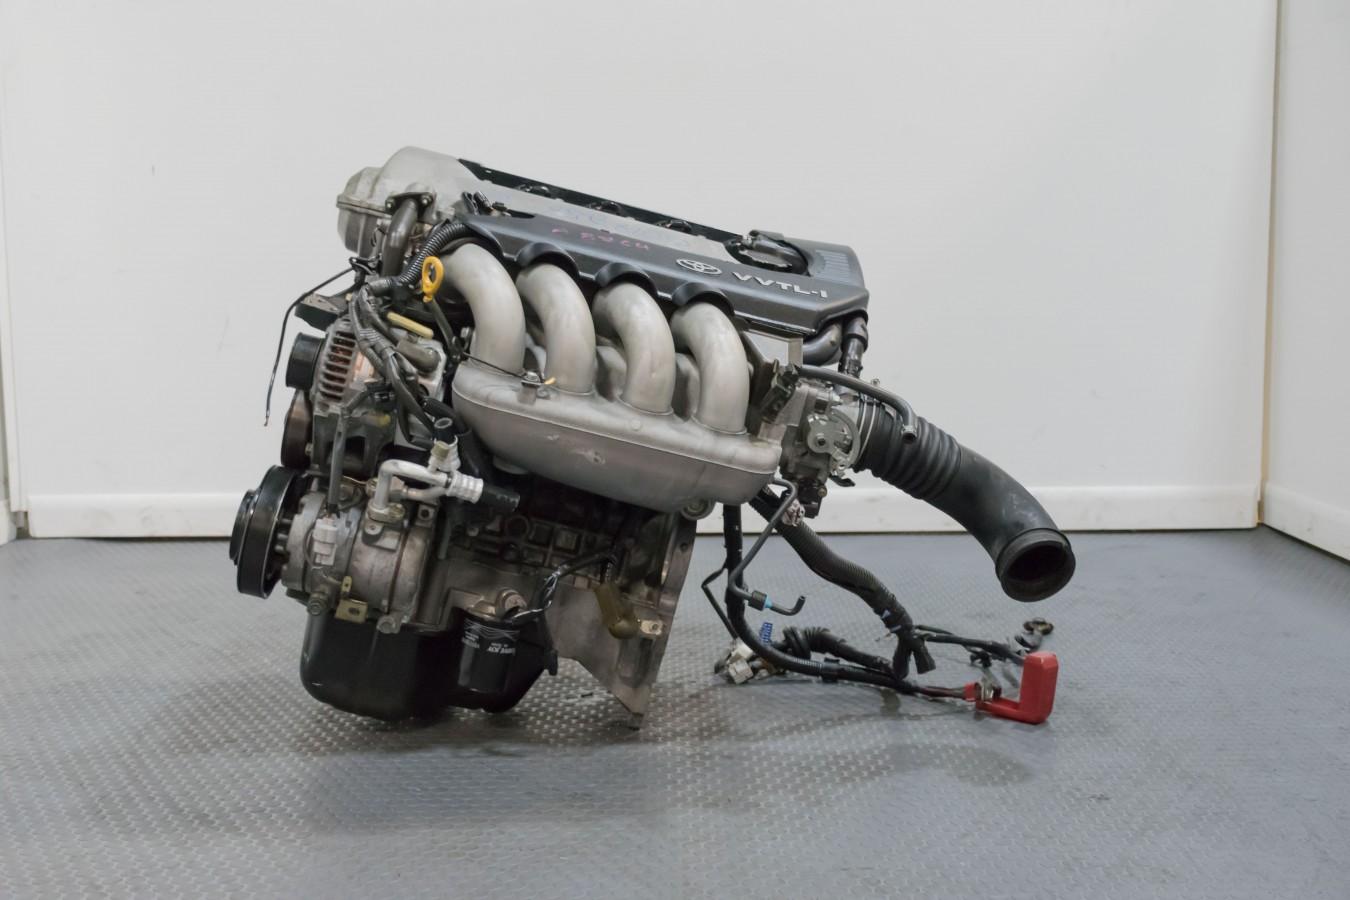 Premium Quality Toyota Celica GTS 2ZZ VVTL-i Engine Corolla Matrix XRS  2ZZ-GE Motor 2000 2001 2002 2003 2004 2005